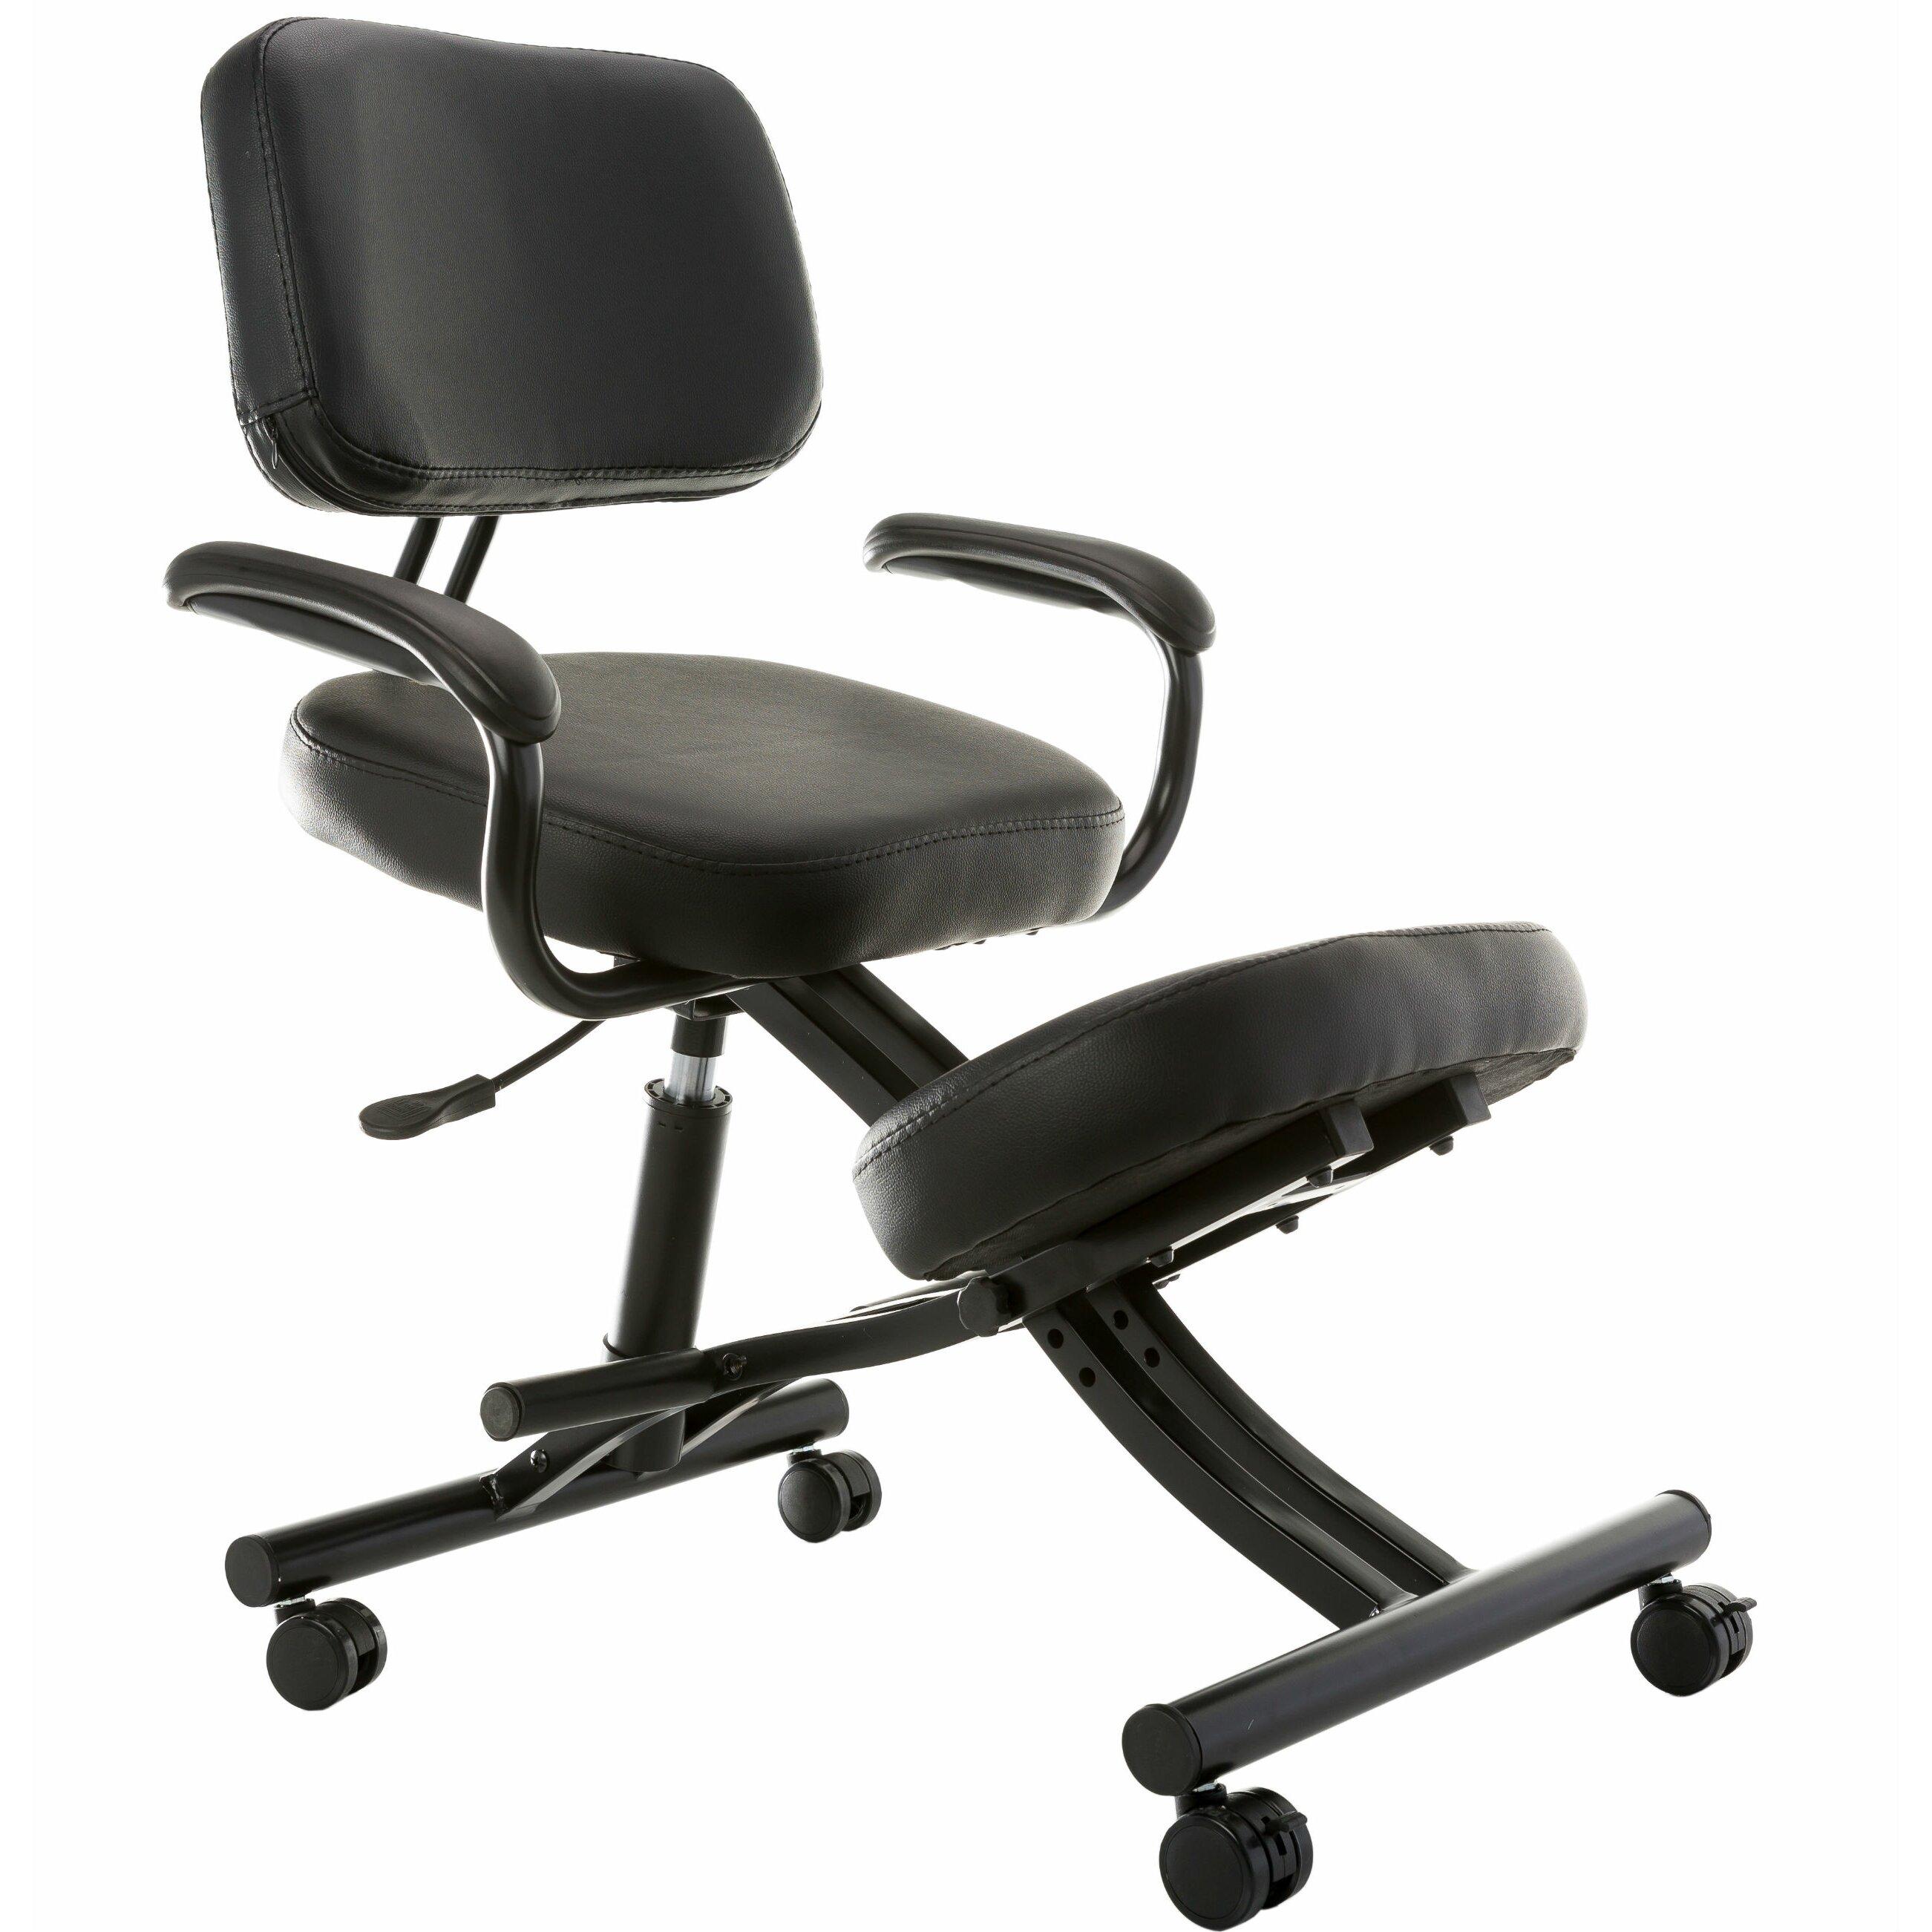 Sierra fort Ergonomic Low Back Kneeling Chair